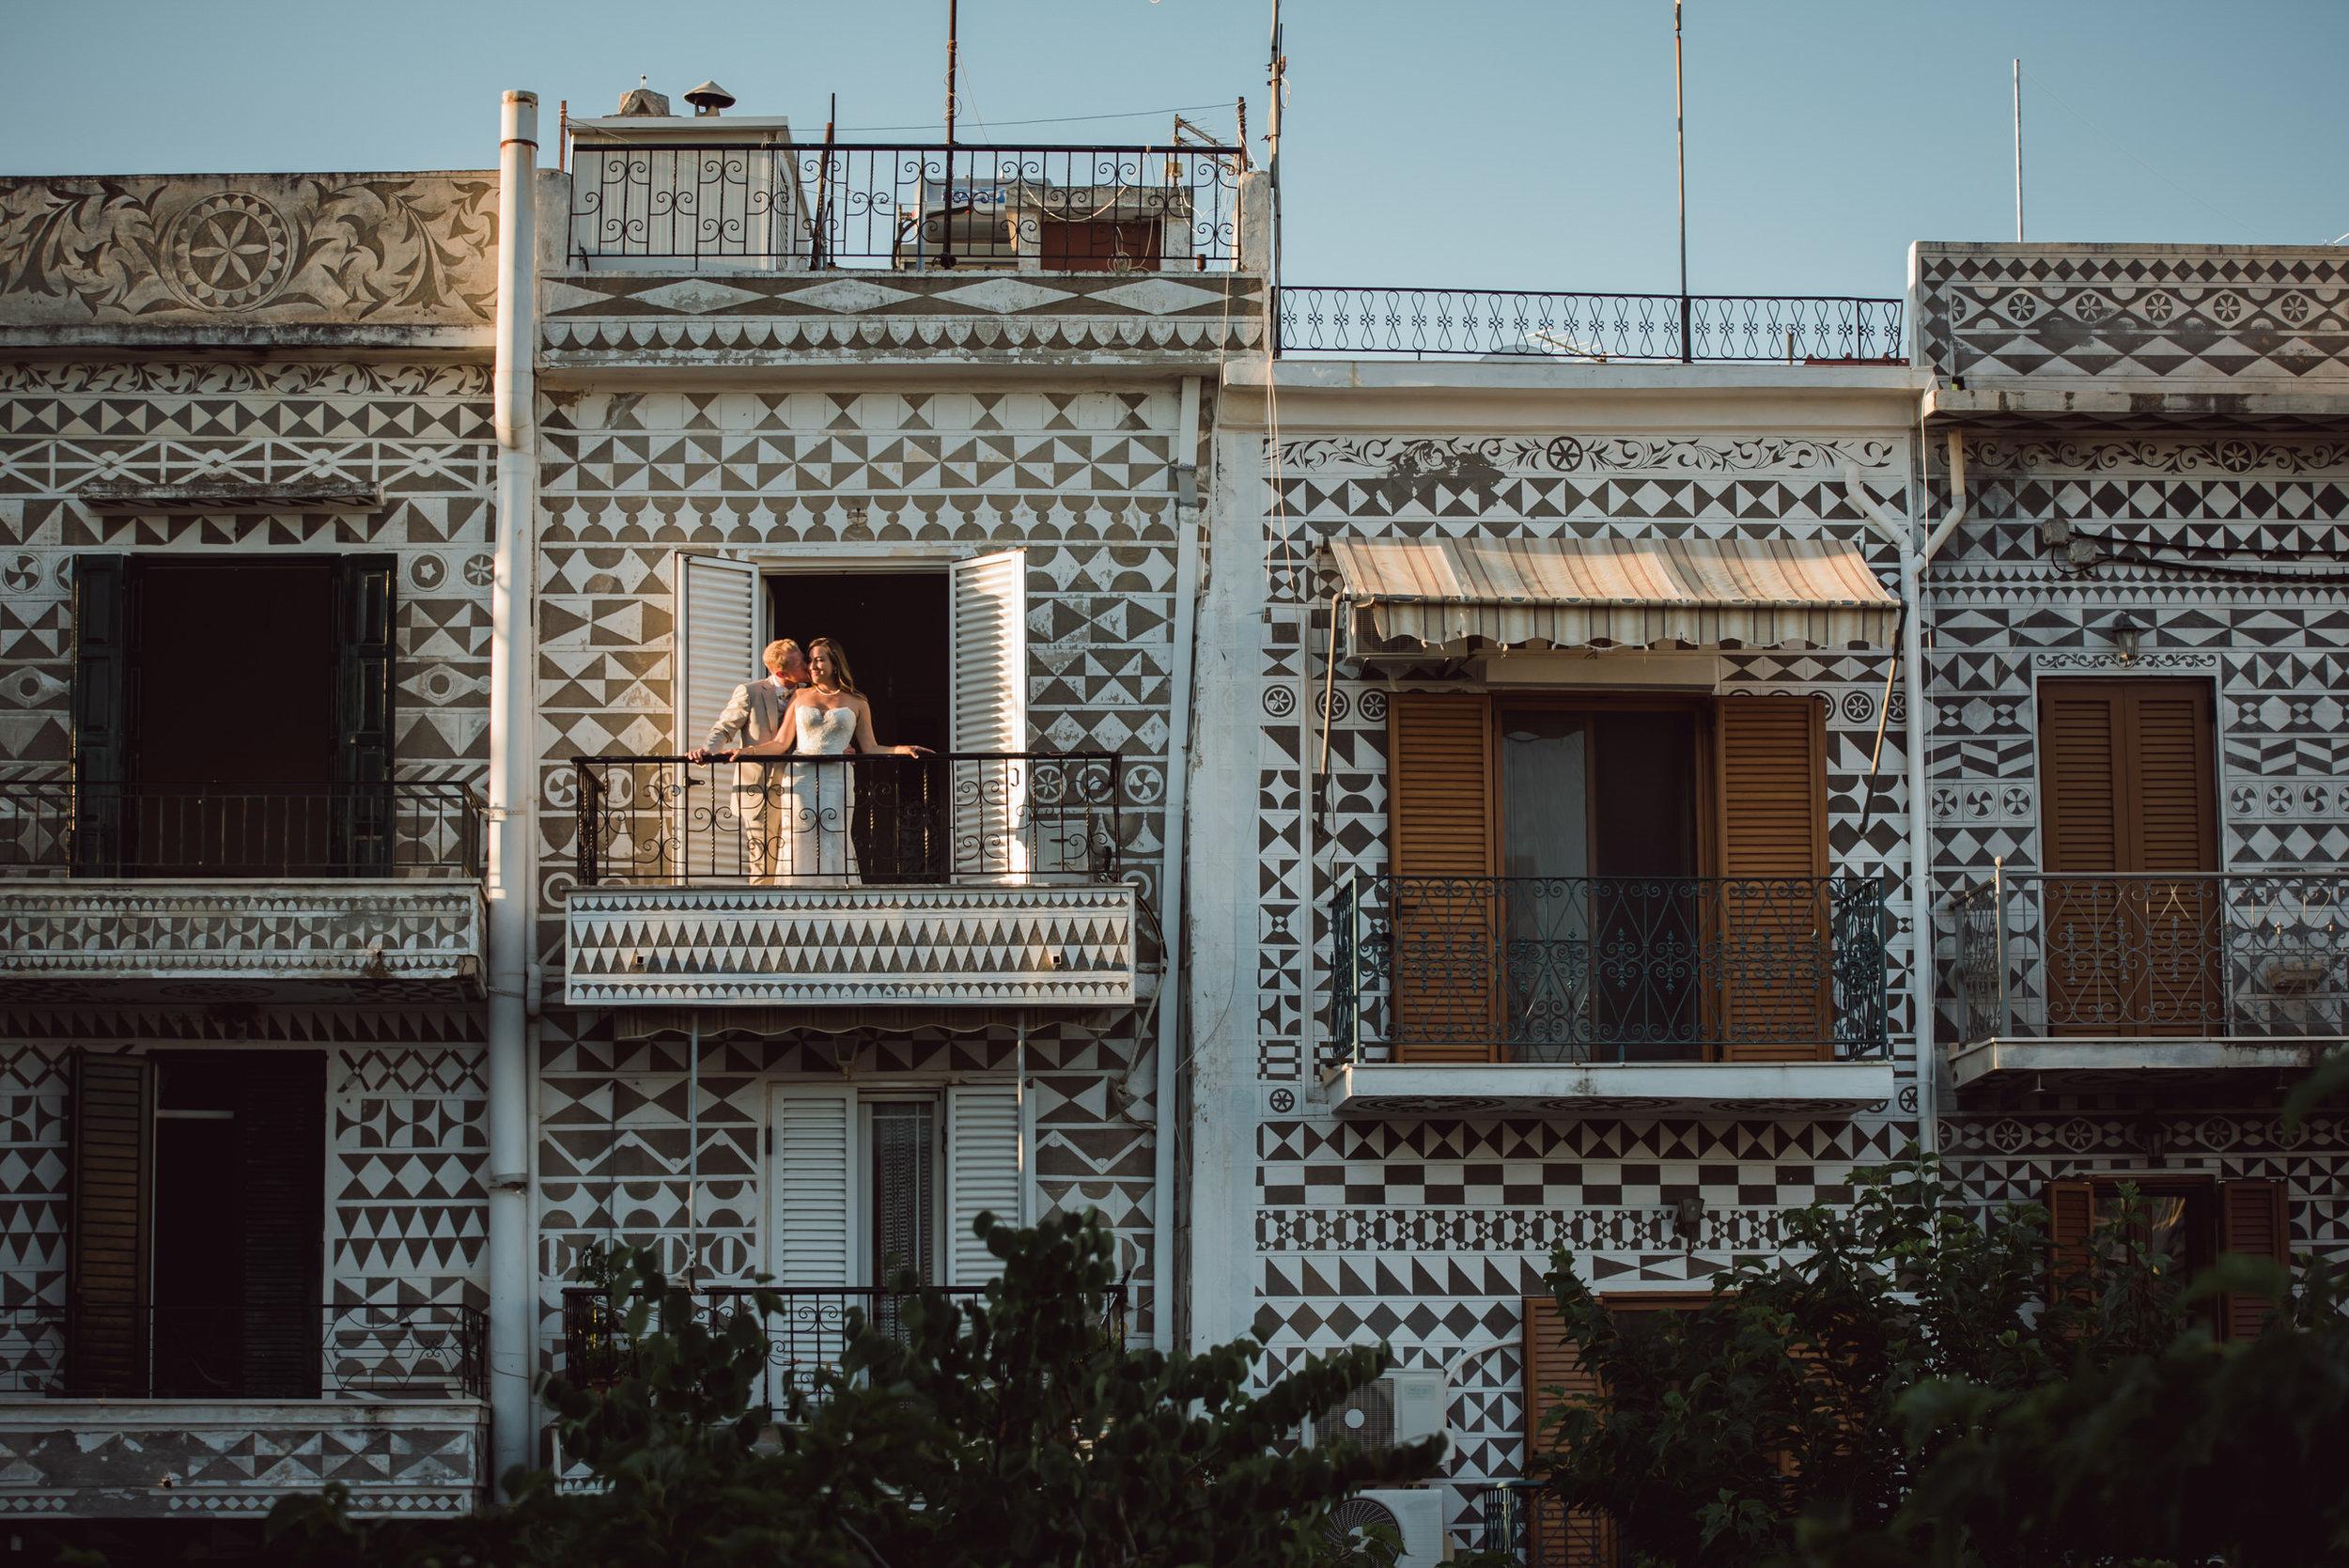 GreeceWedding-Tricia&Will-DayAfter-1.jpg